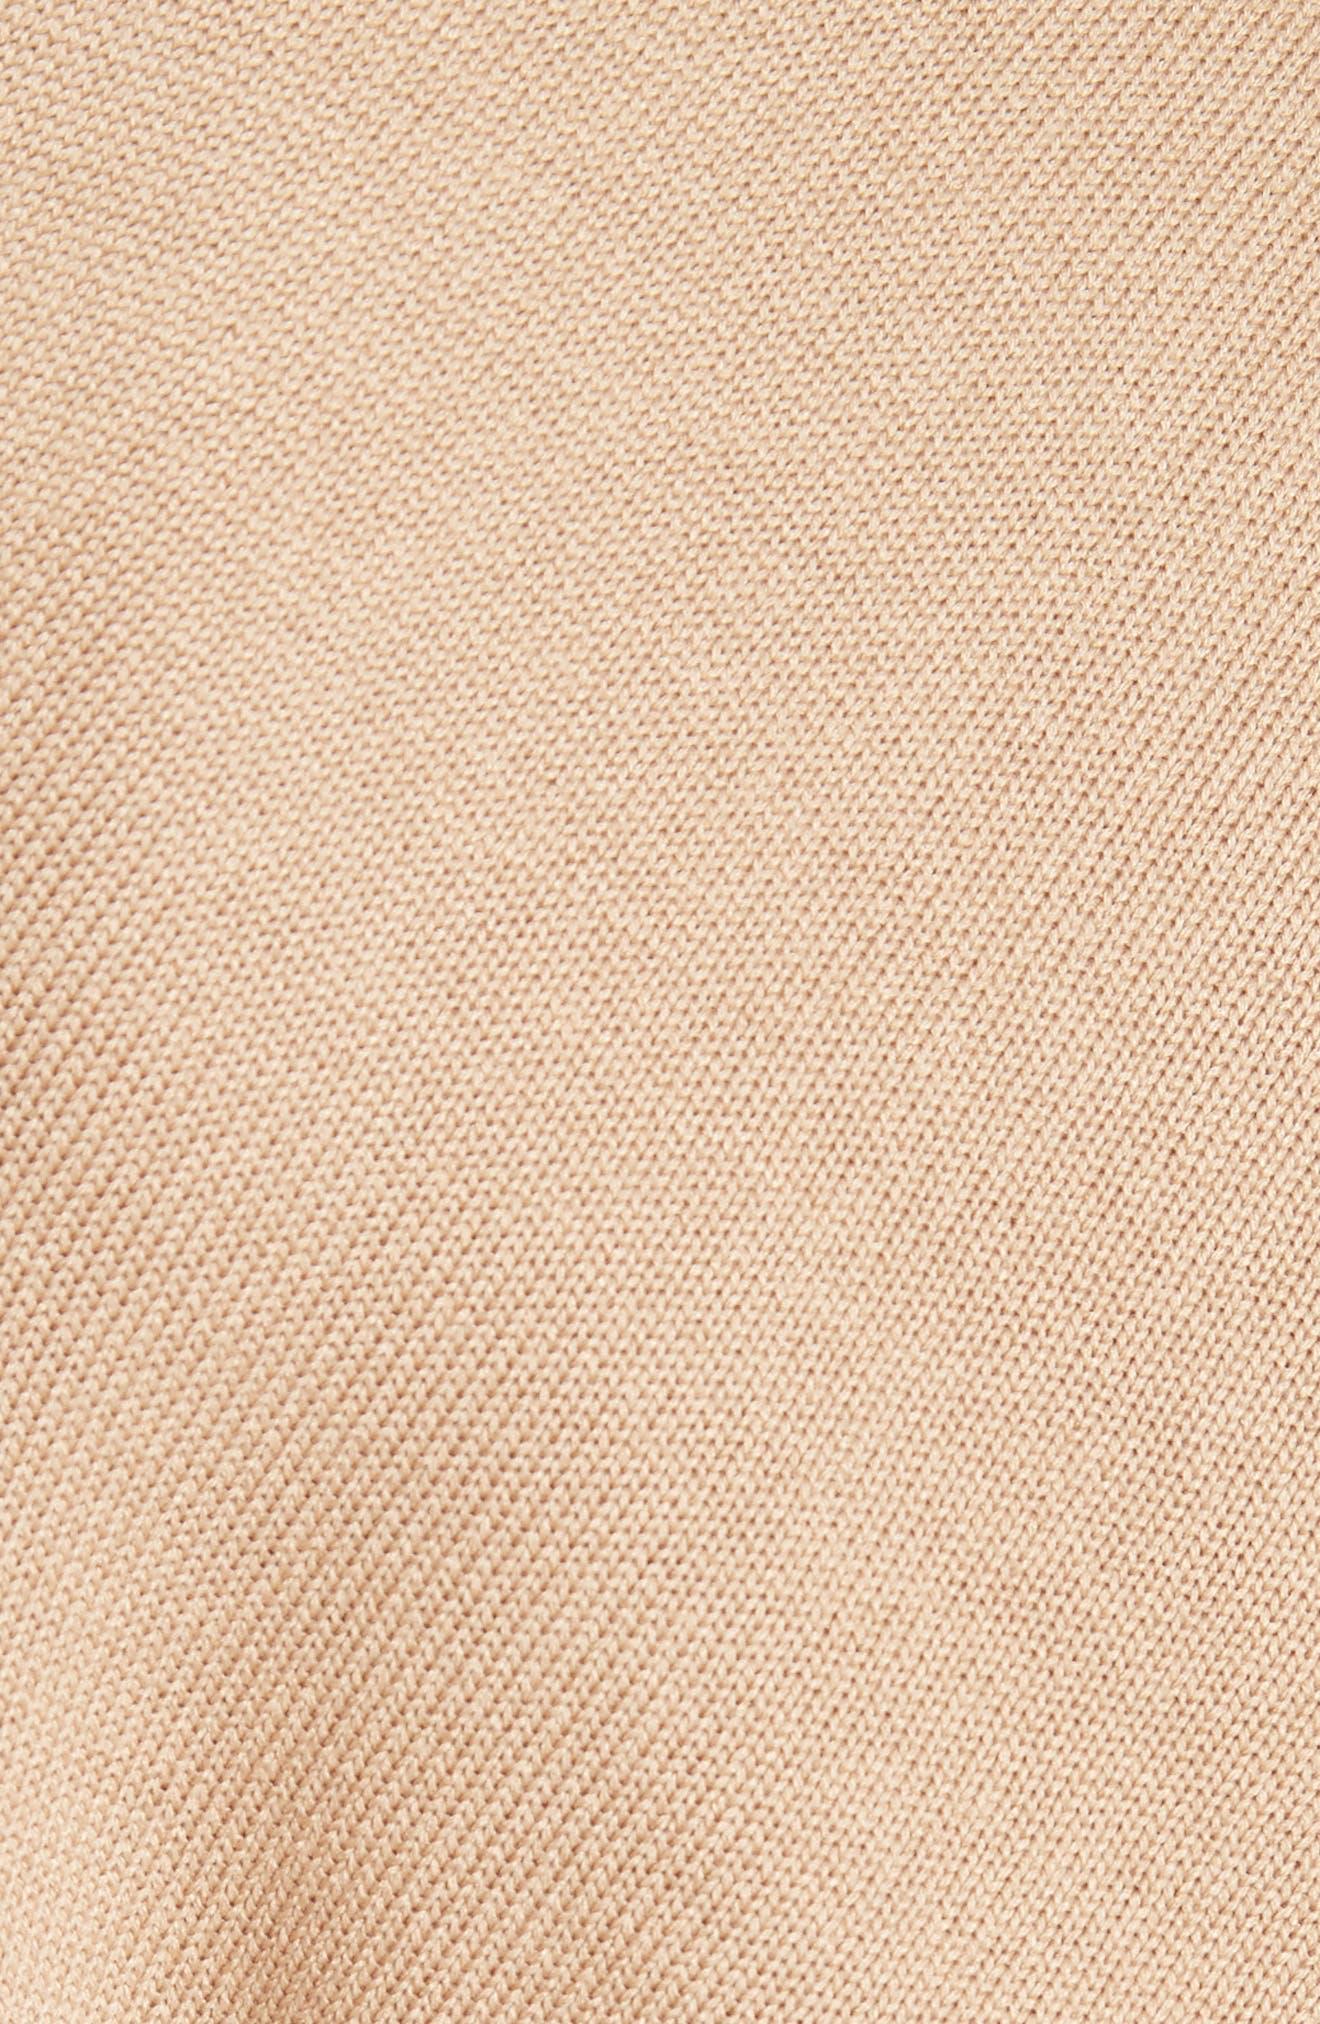 Tie Detail V-Neck Sweater,                             Alternate thumbnail 5, color,                             250